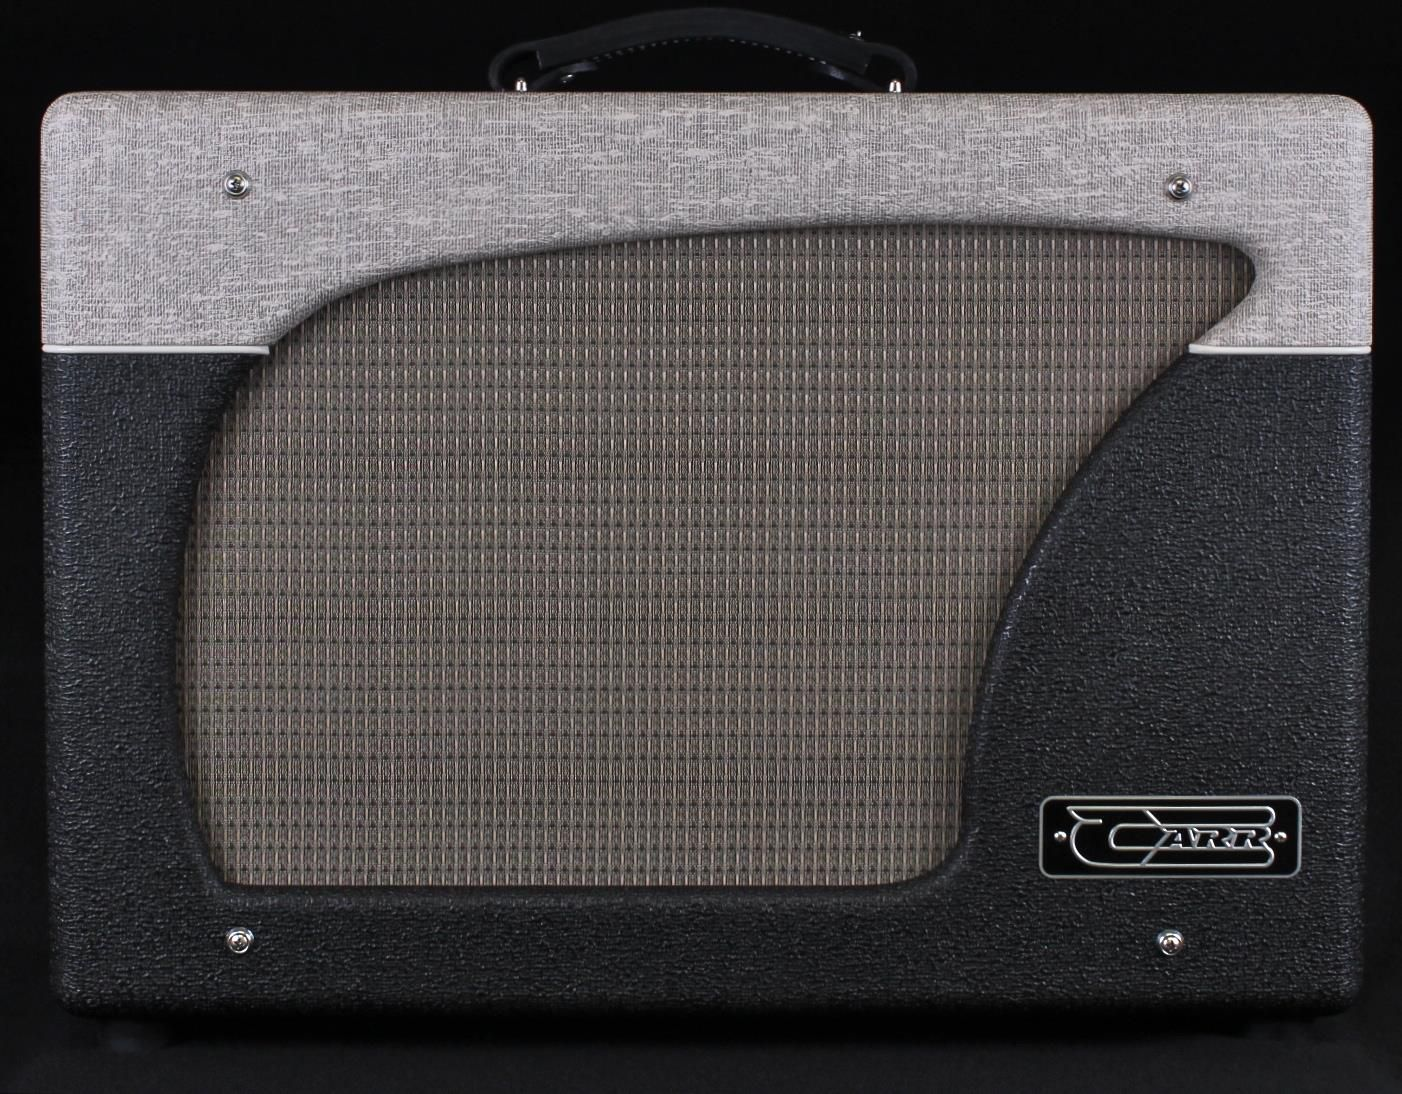 Amplifier Stash - George's Music Center